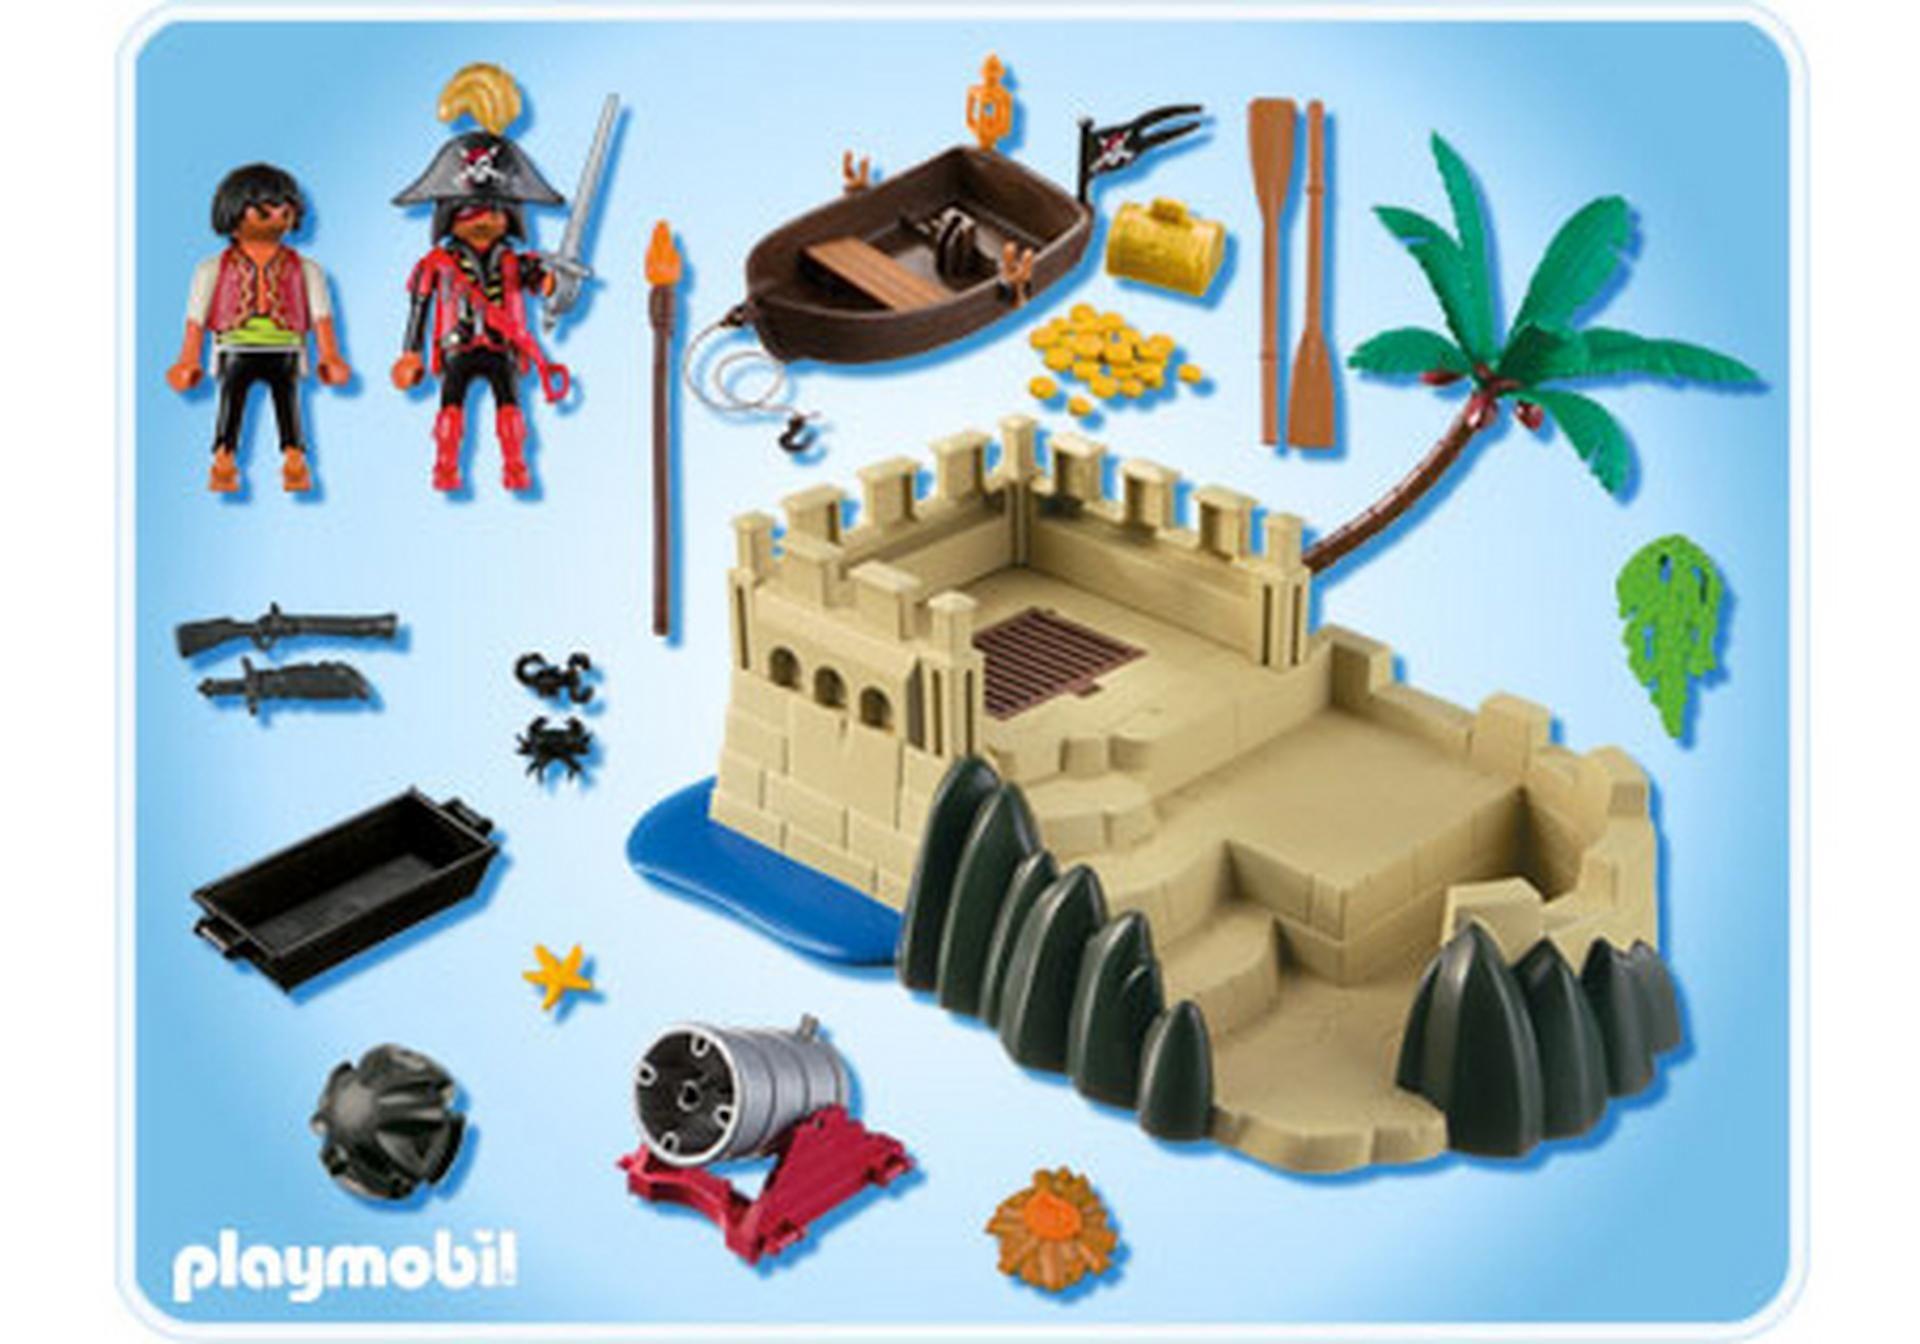 4007A_product_box_back 1,920×1,344 pixels Playmobil